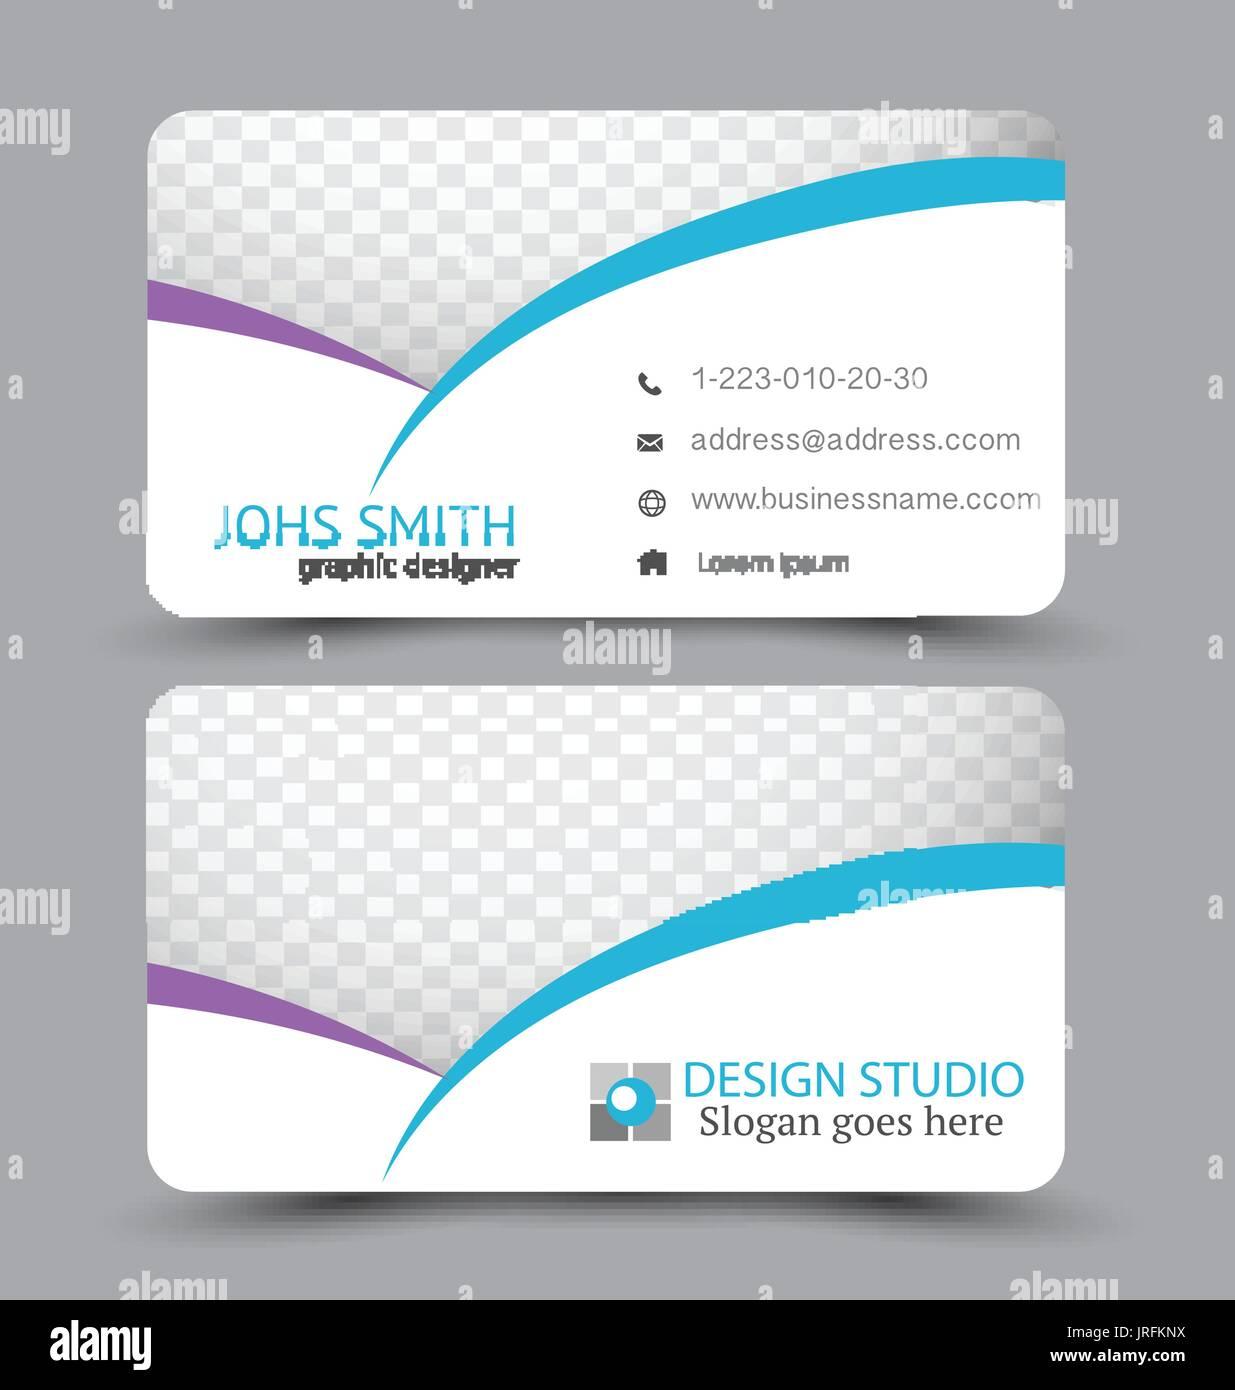 Business card design set template for company corporate style business card design set template for company corporate style purple and blue color vector illustration colourmoves